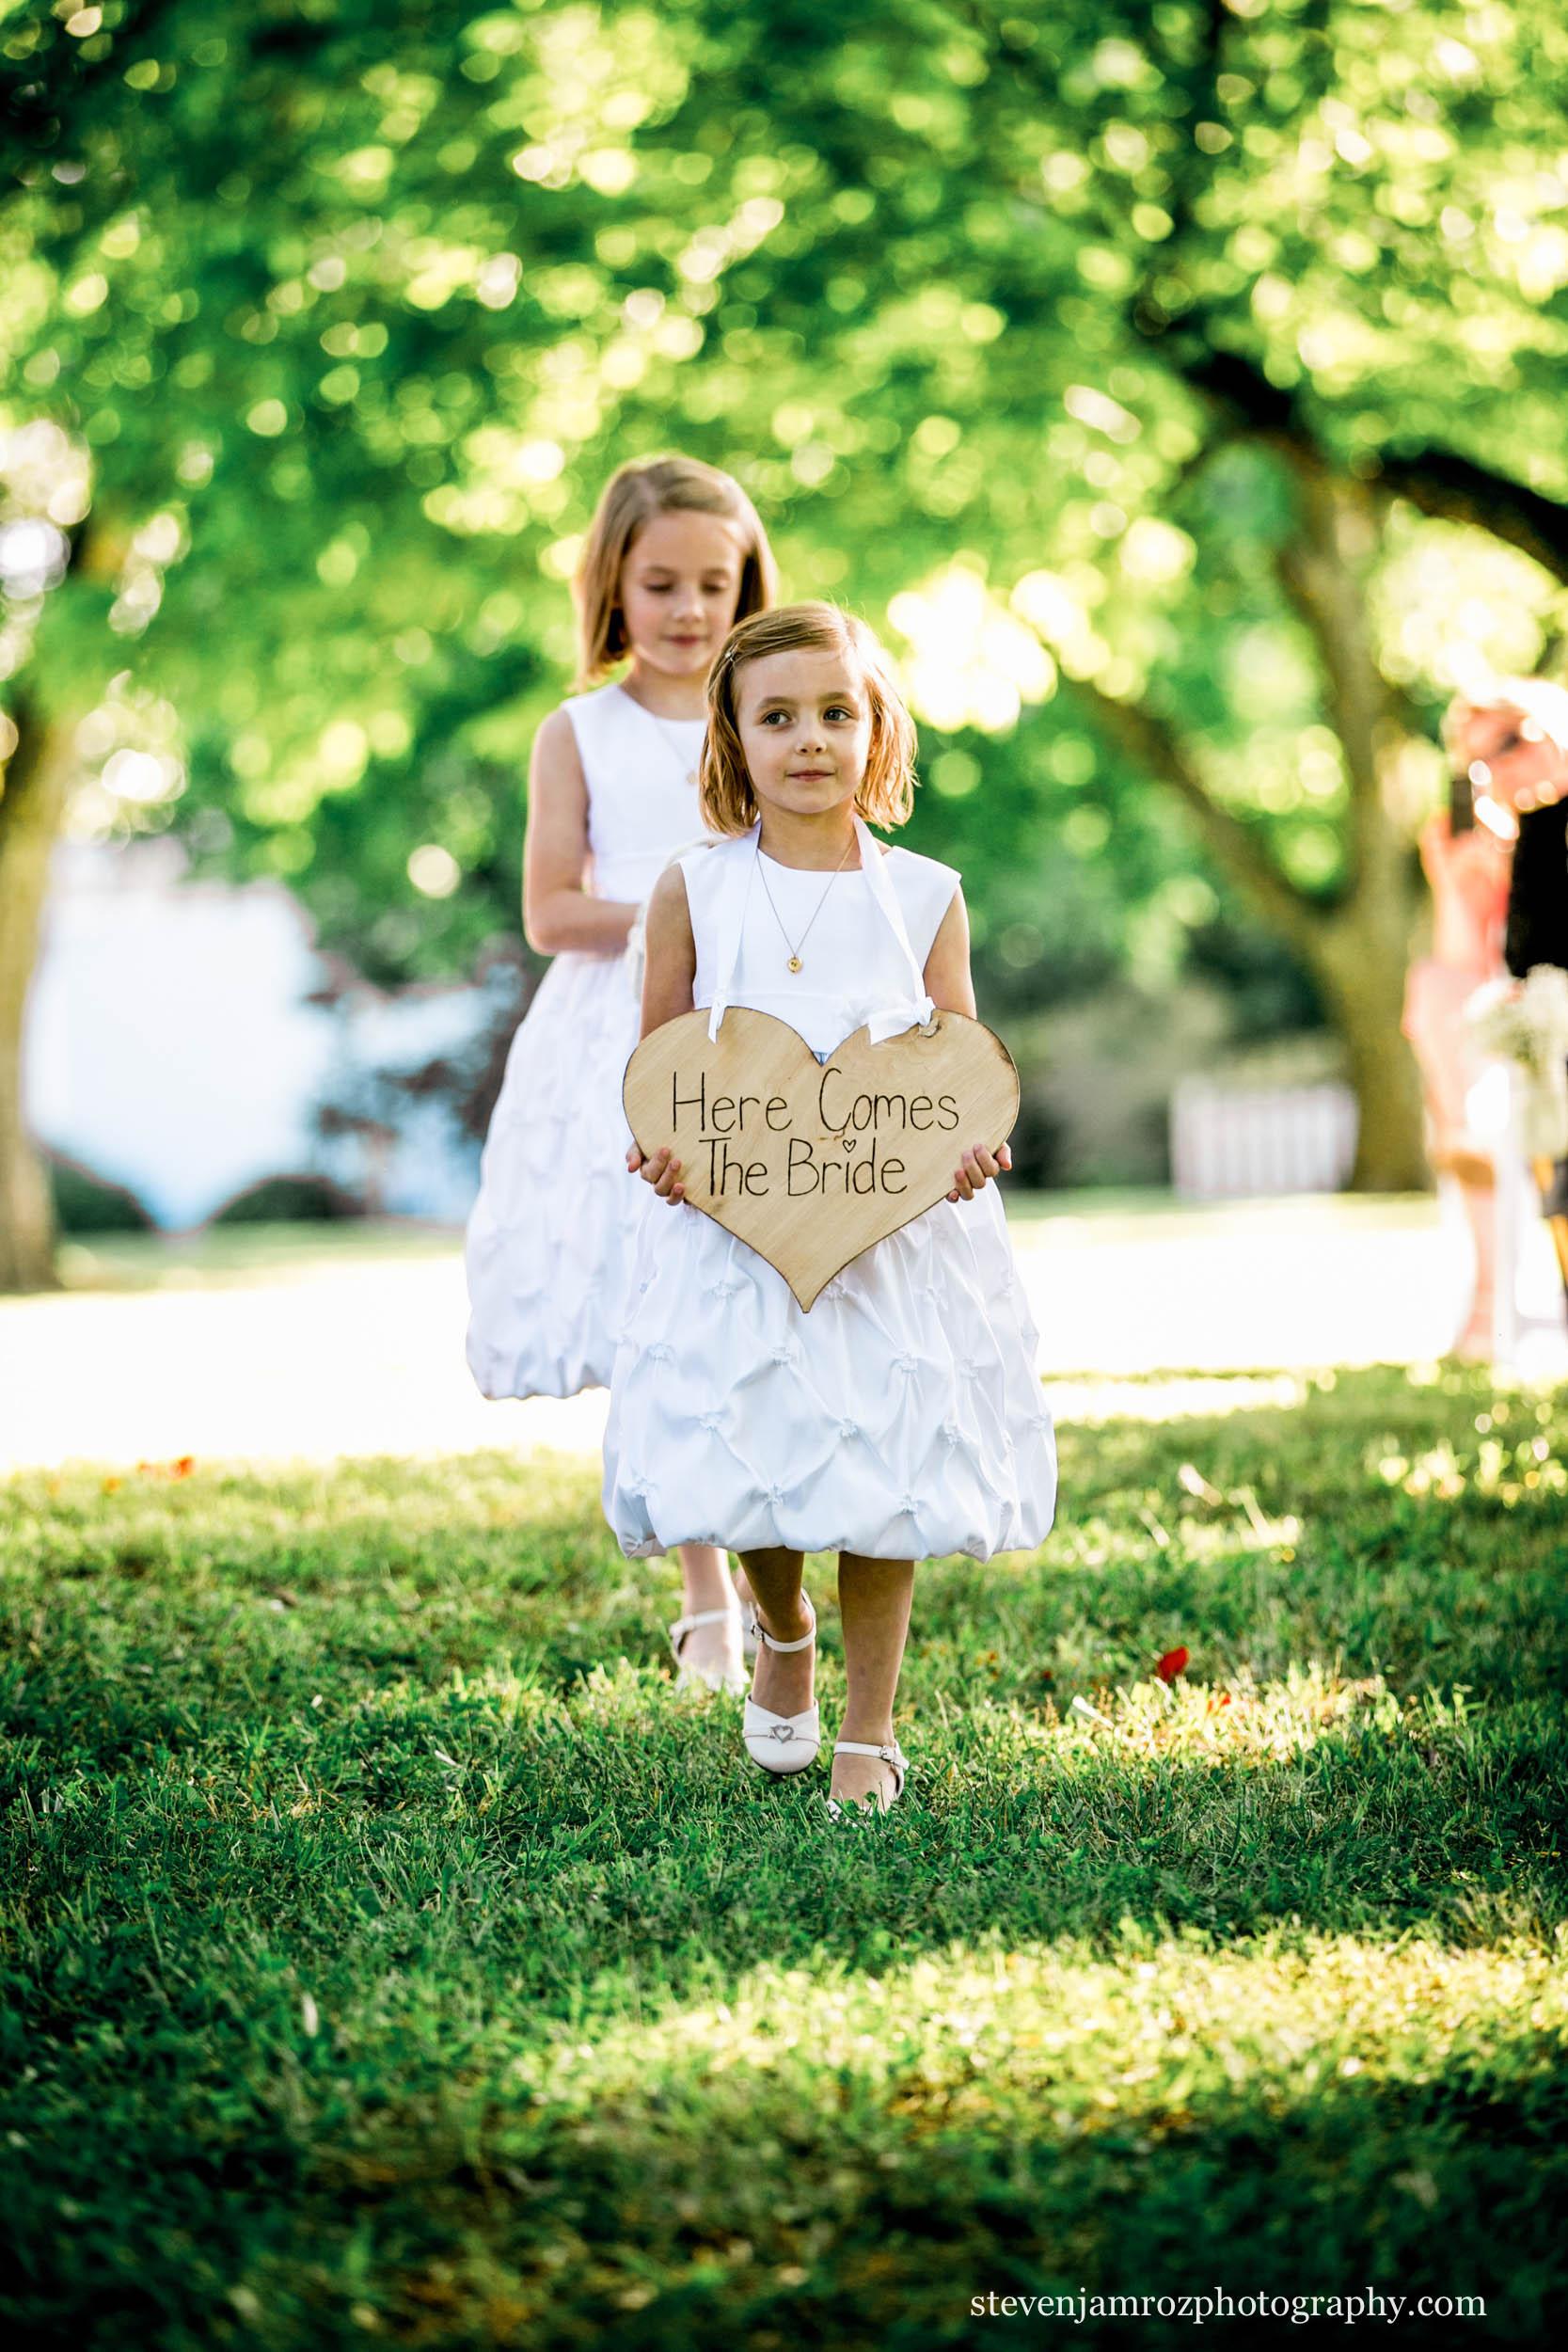 here-comes-bride-sign-steven-jamroz-photography-0314.jpg